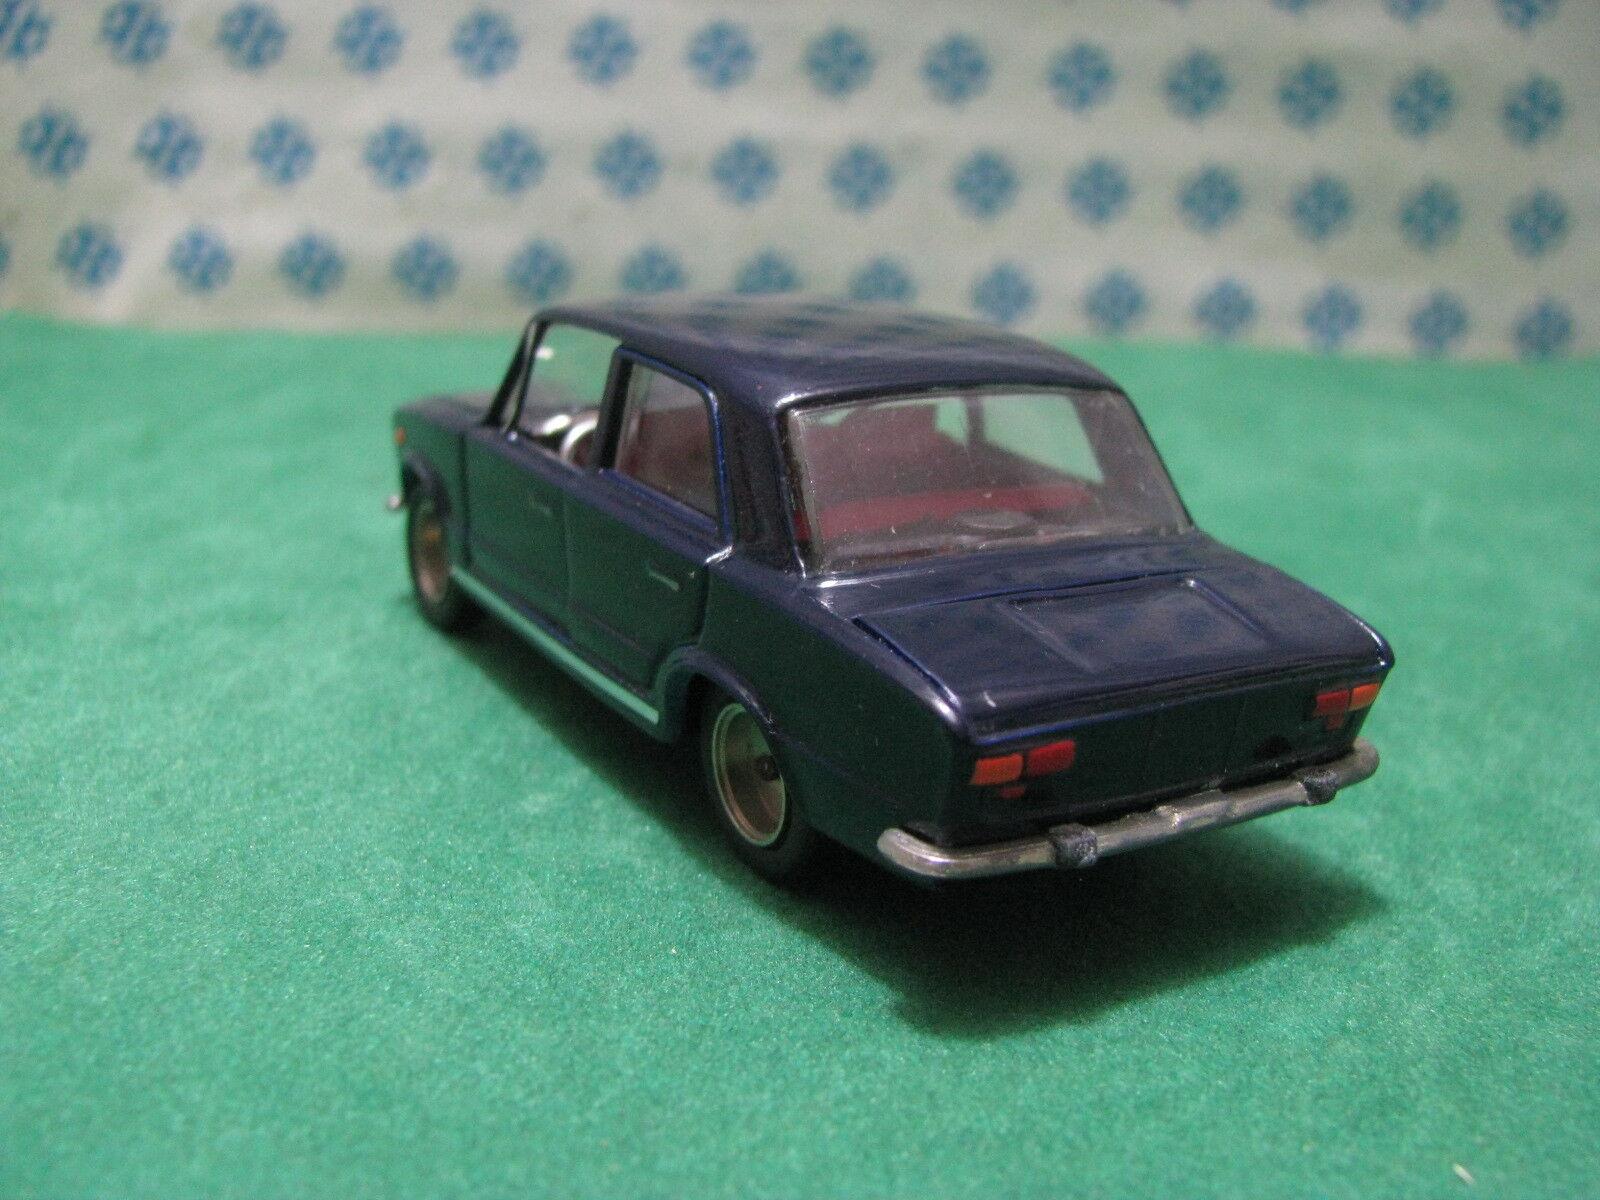 Vintage - FIAT FIAT FIAT 124 Code 3 processed - 1 43 Mebetoys A-41 5c6148